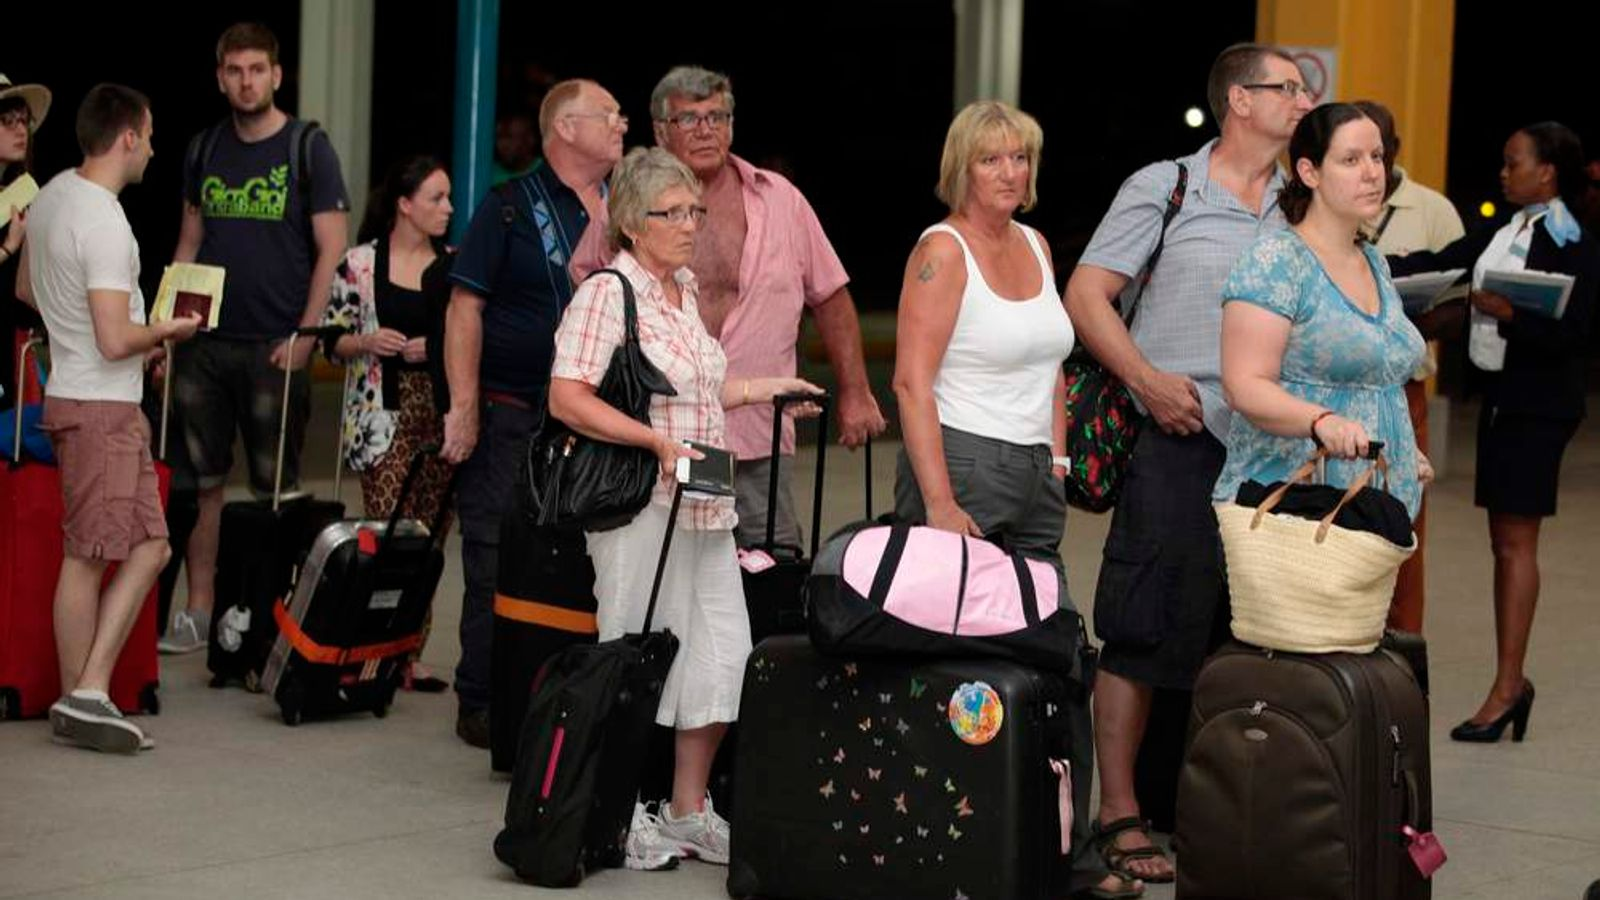 British tourists leaving Kenya